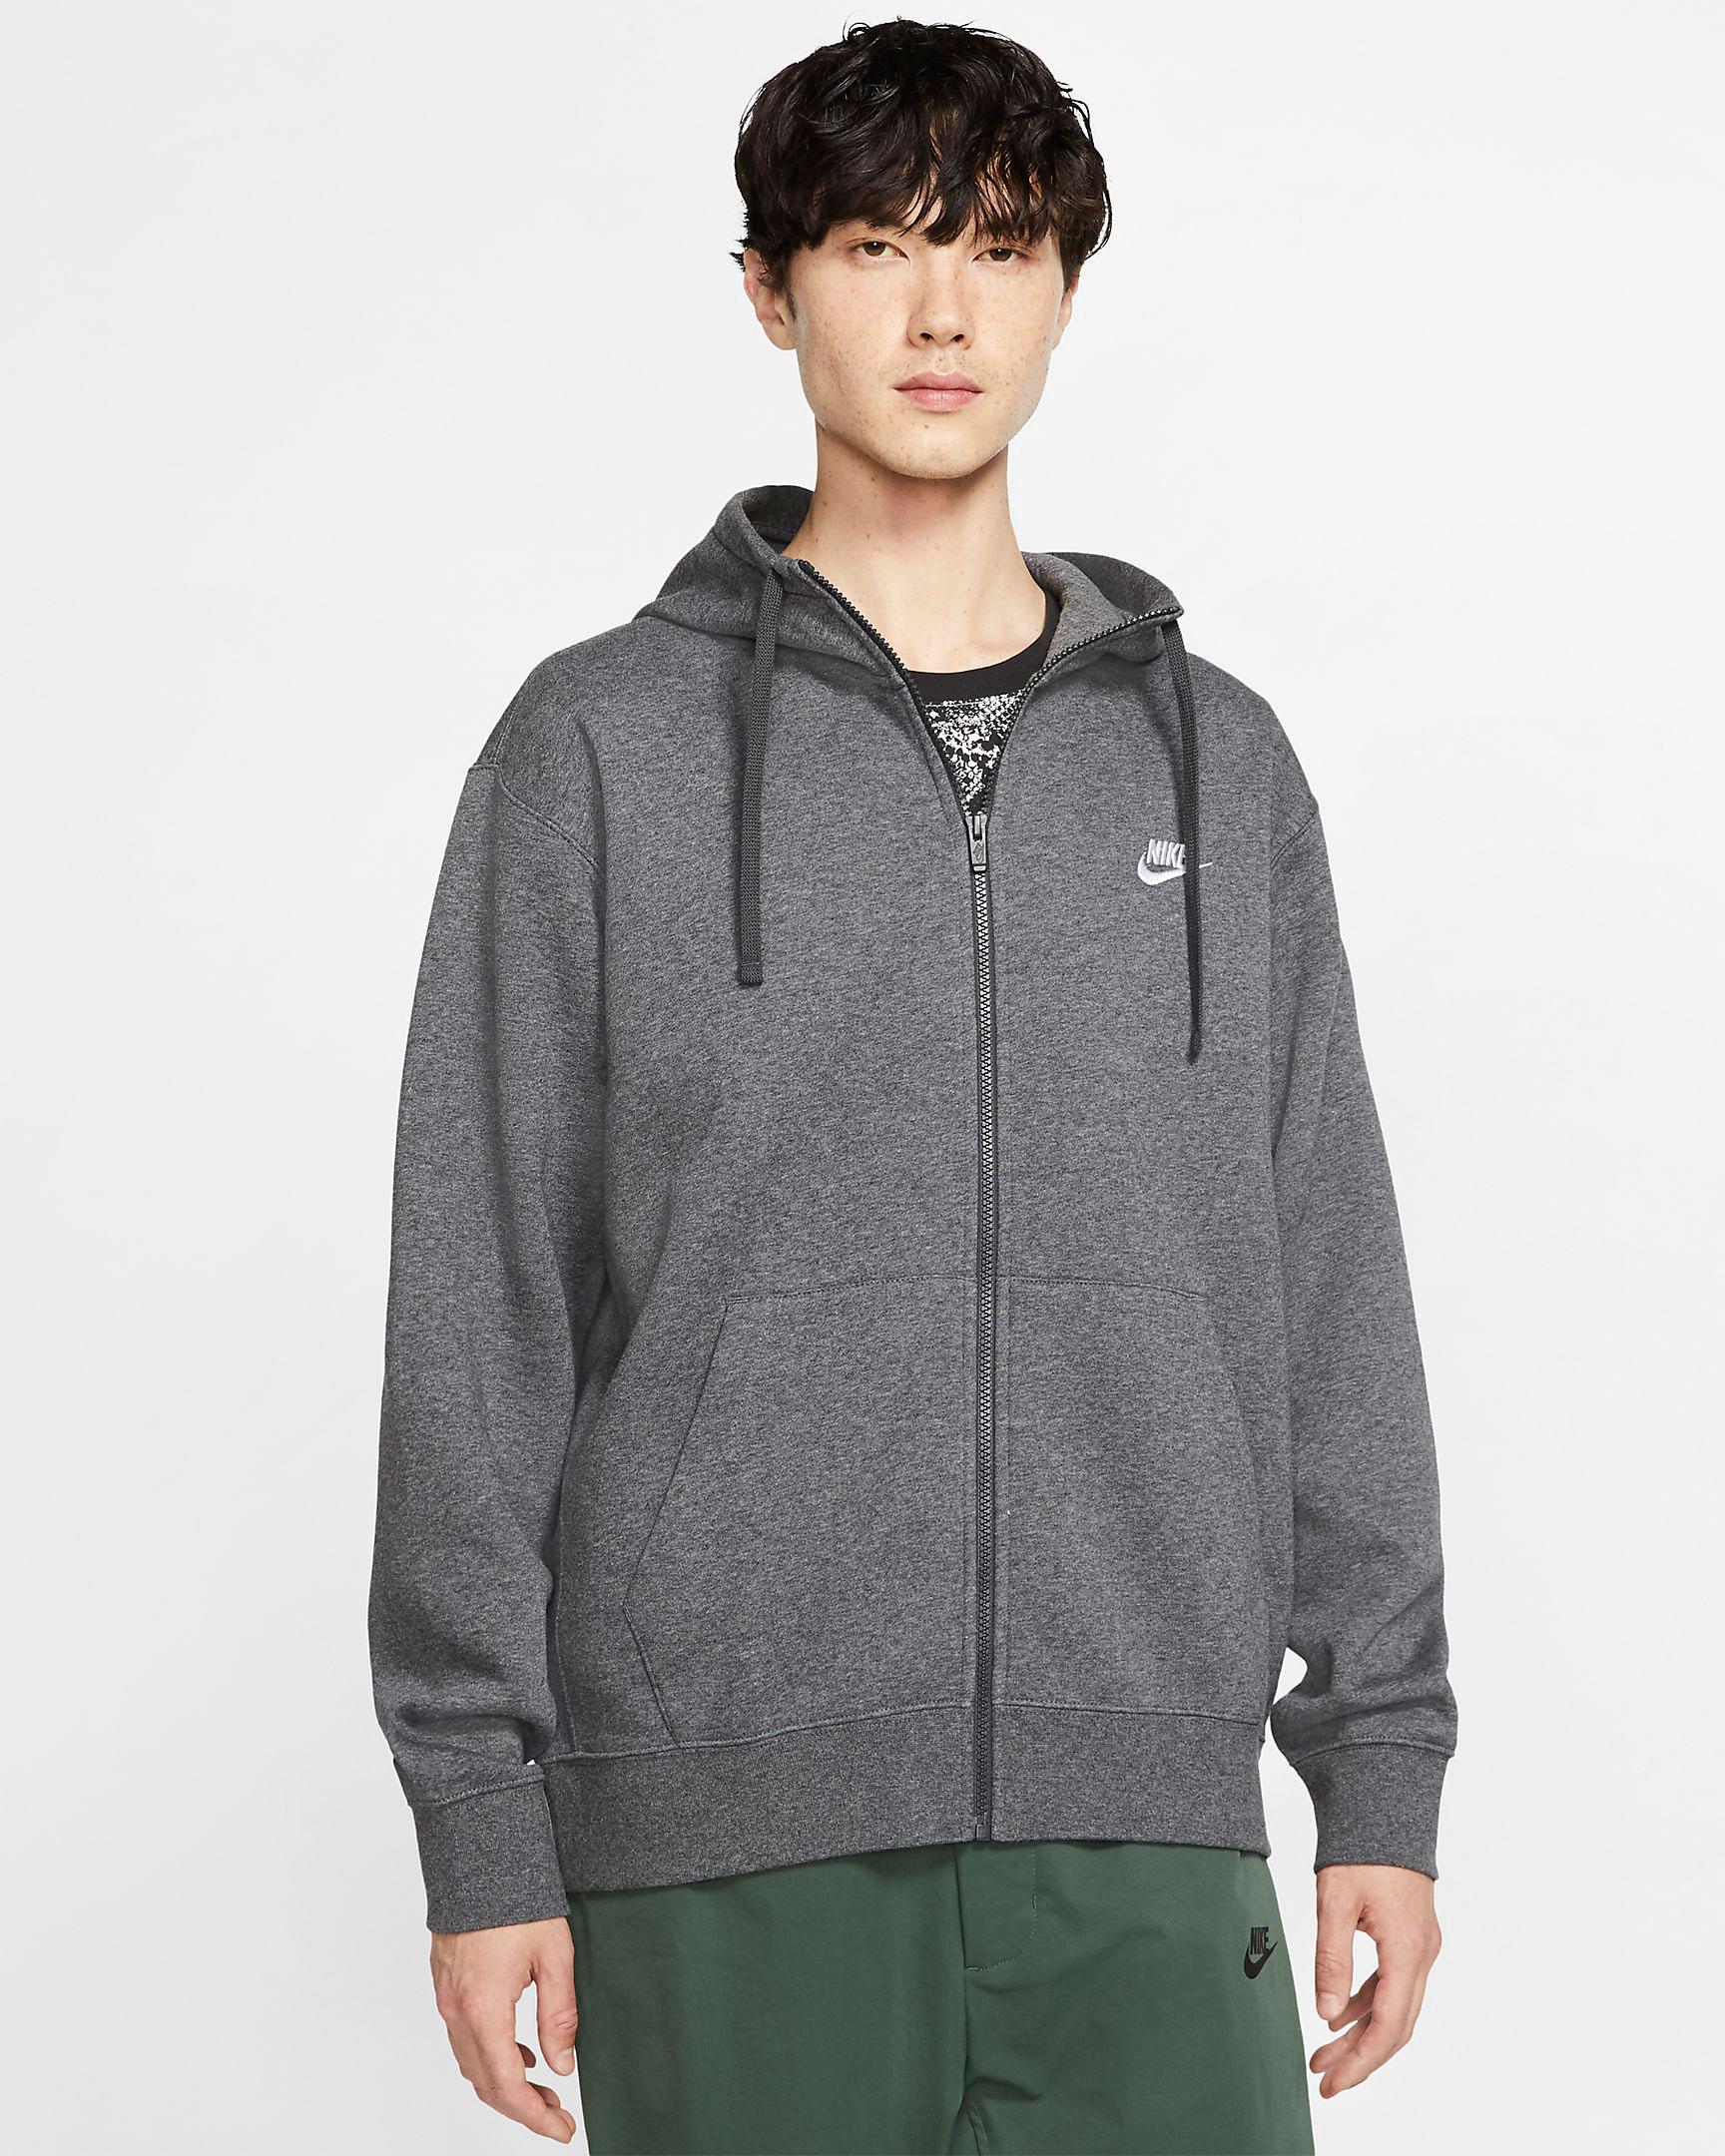 nike-sb-dunk-low-elephant-hoodie-4